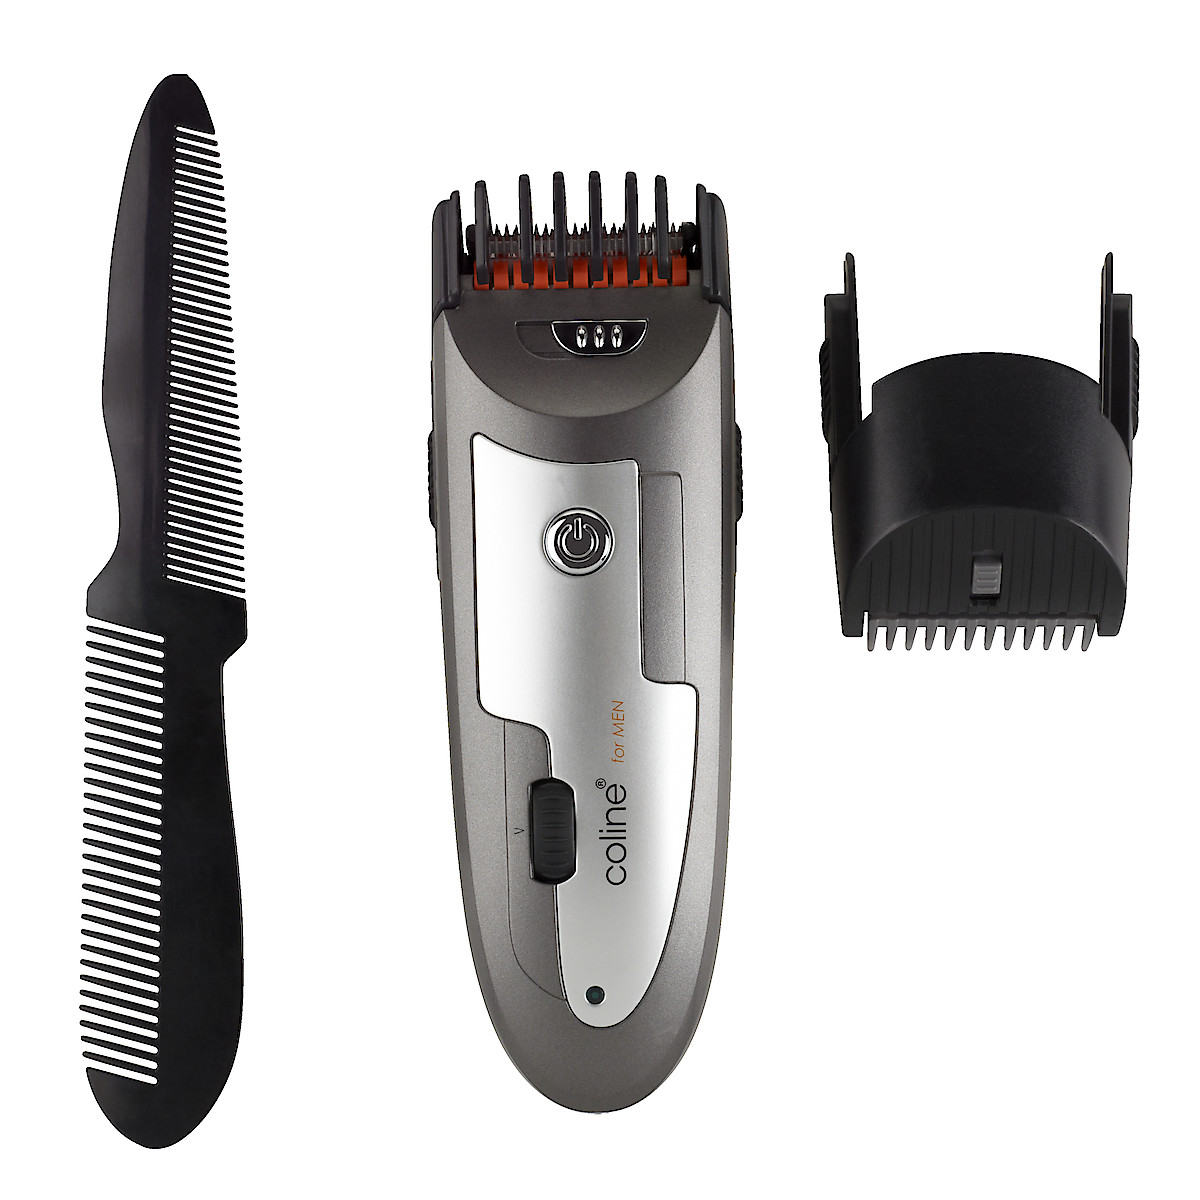 Coline Hair/Beard Trimmer